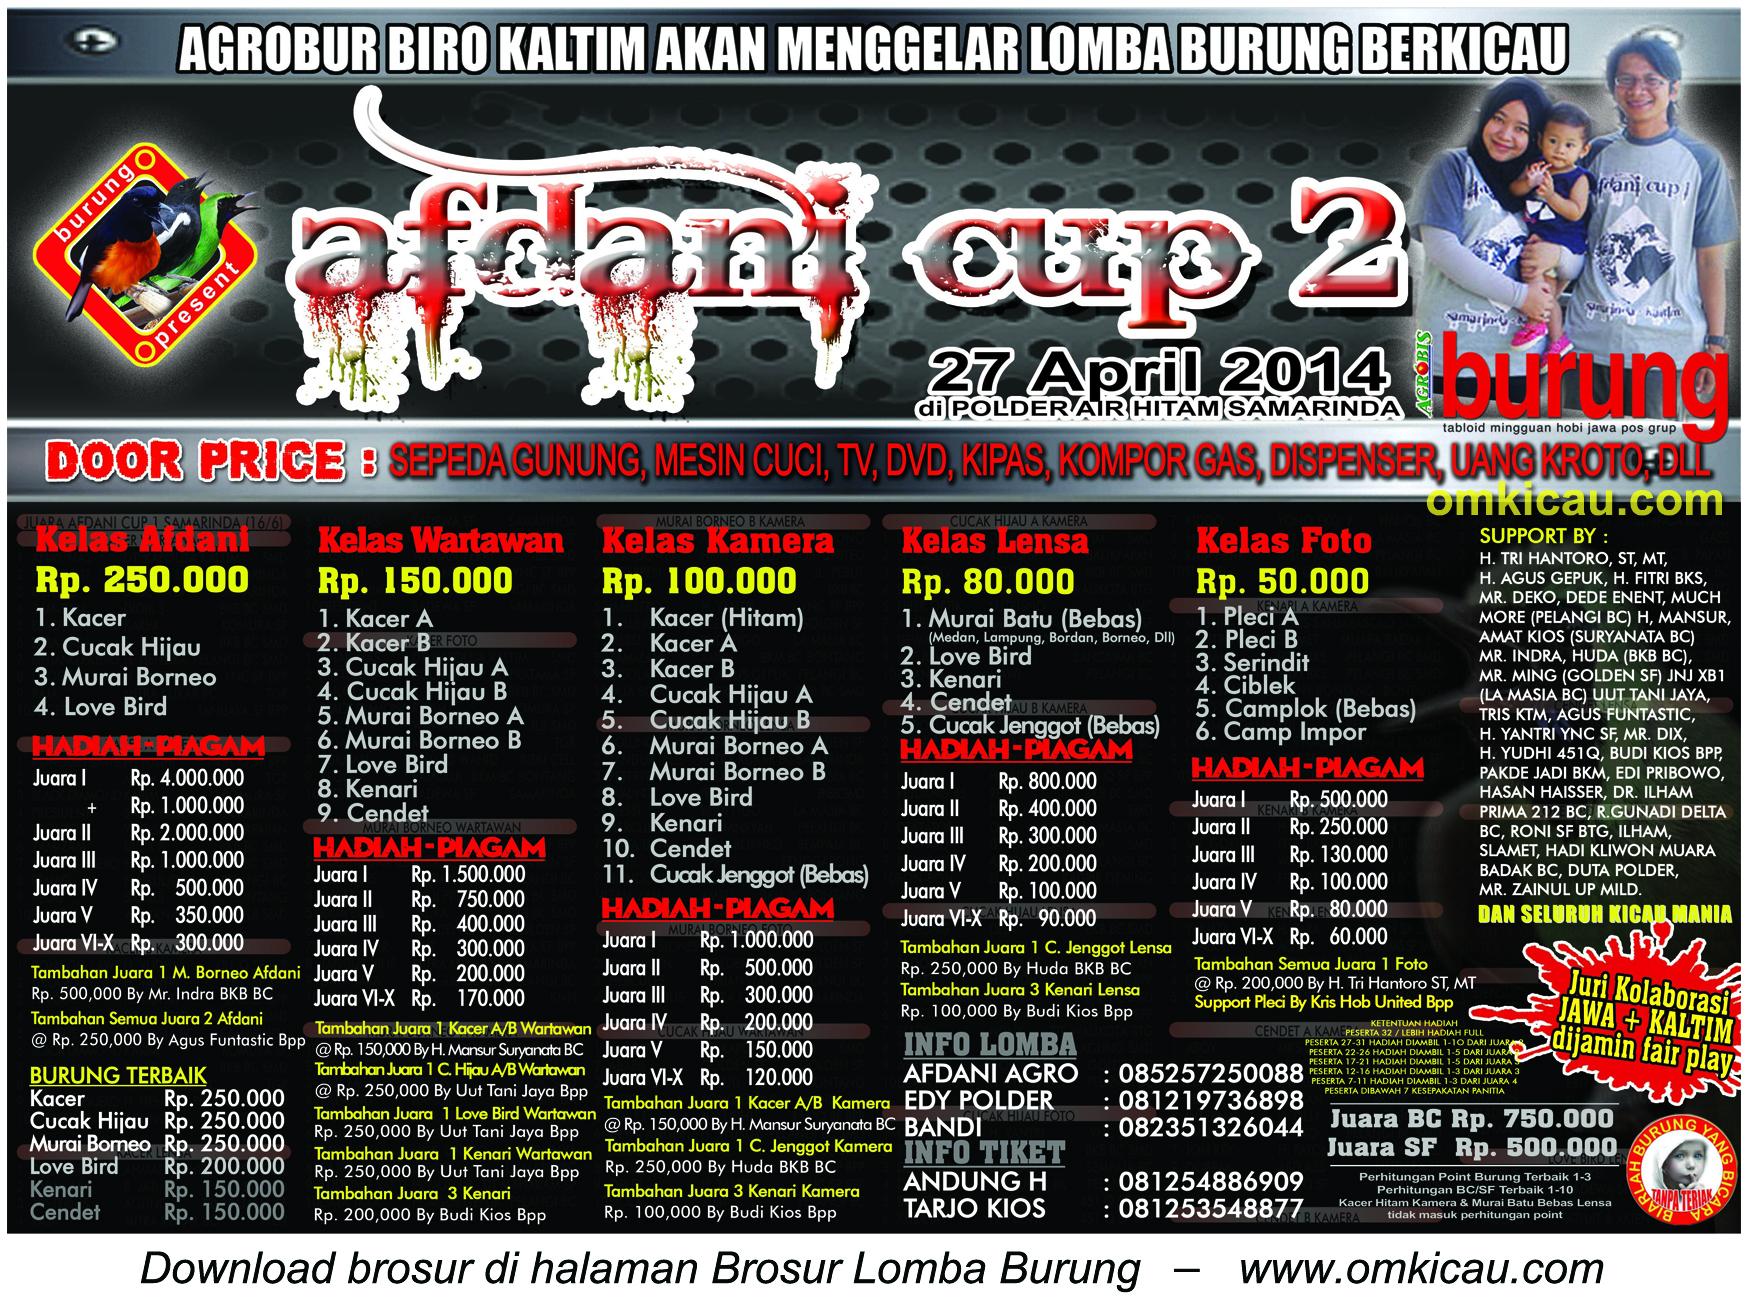 Brosur Lomba Burung Berkicau Afdani Cup 2, Samarinda, 27 April 2014